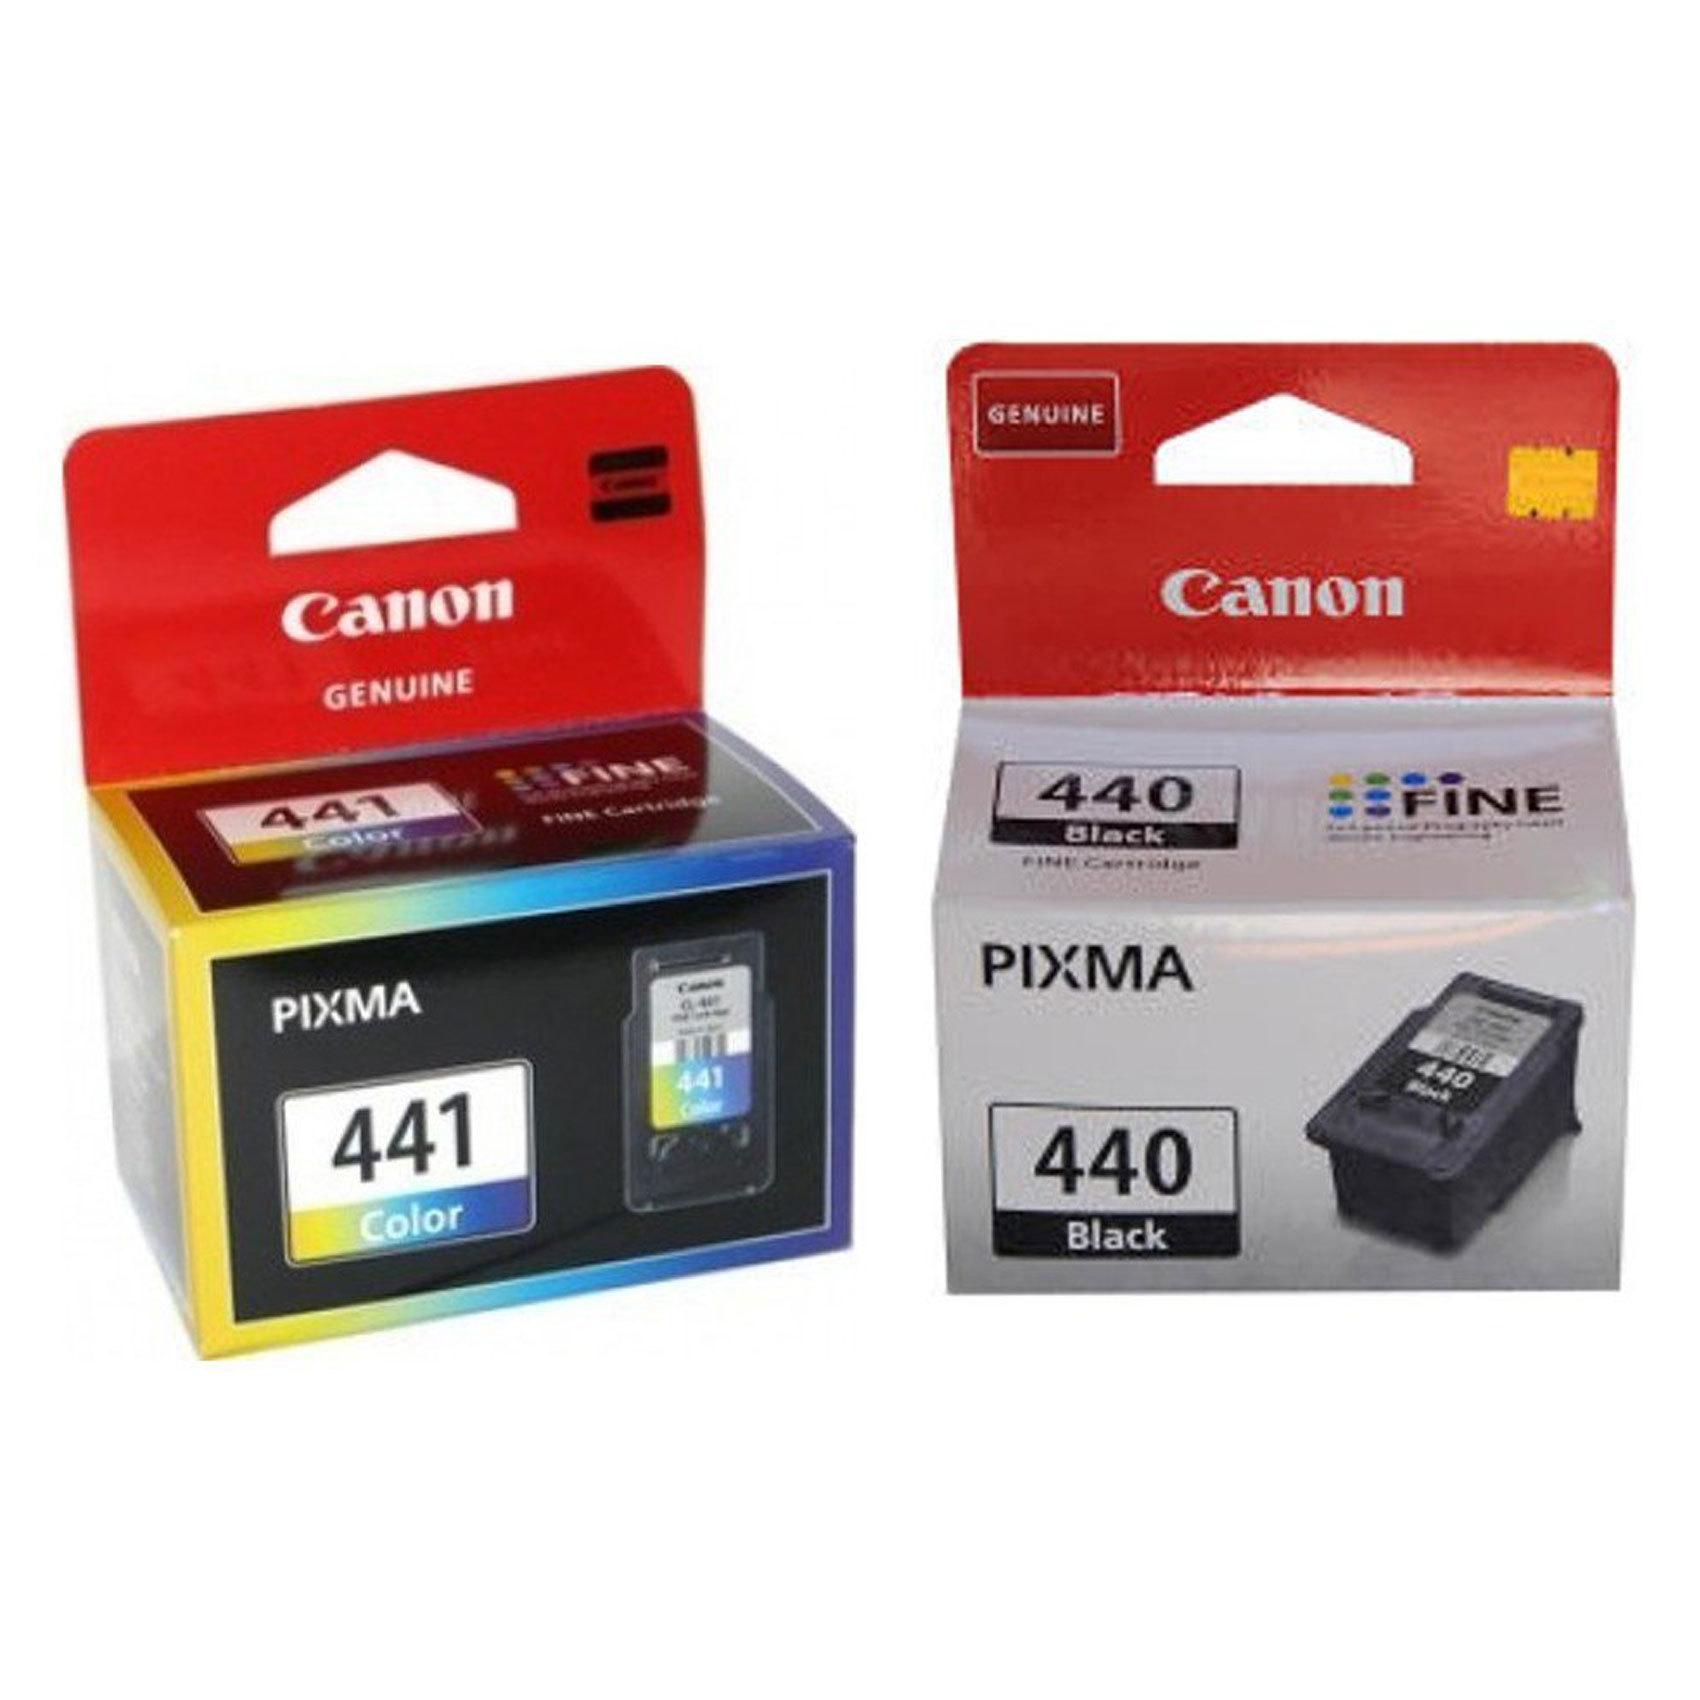 CANON CART PG440 & CL441